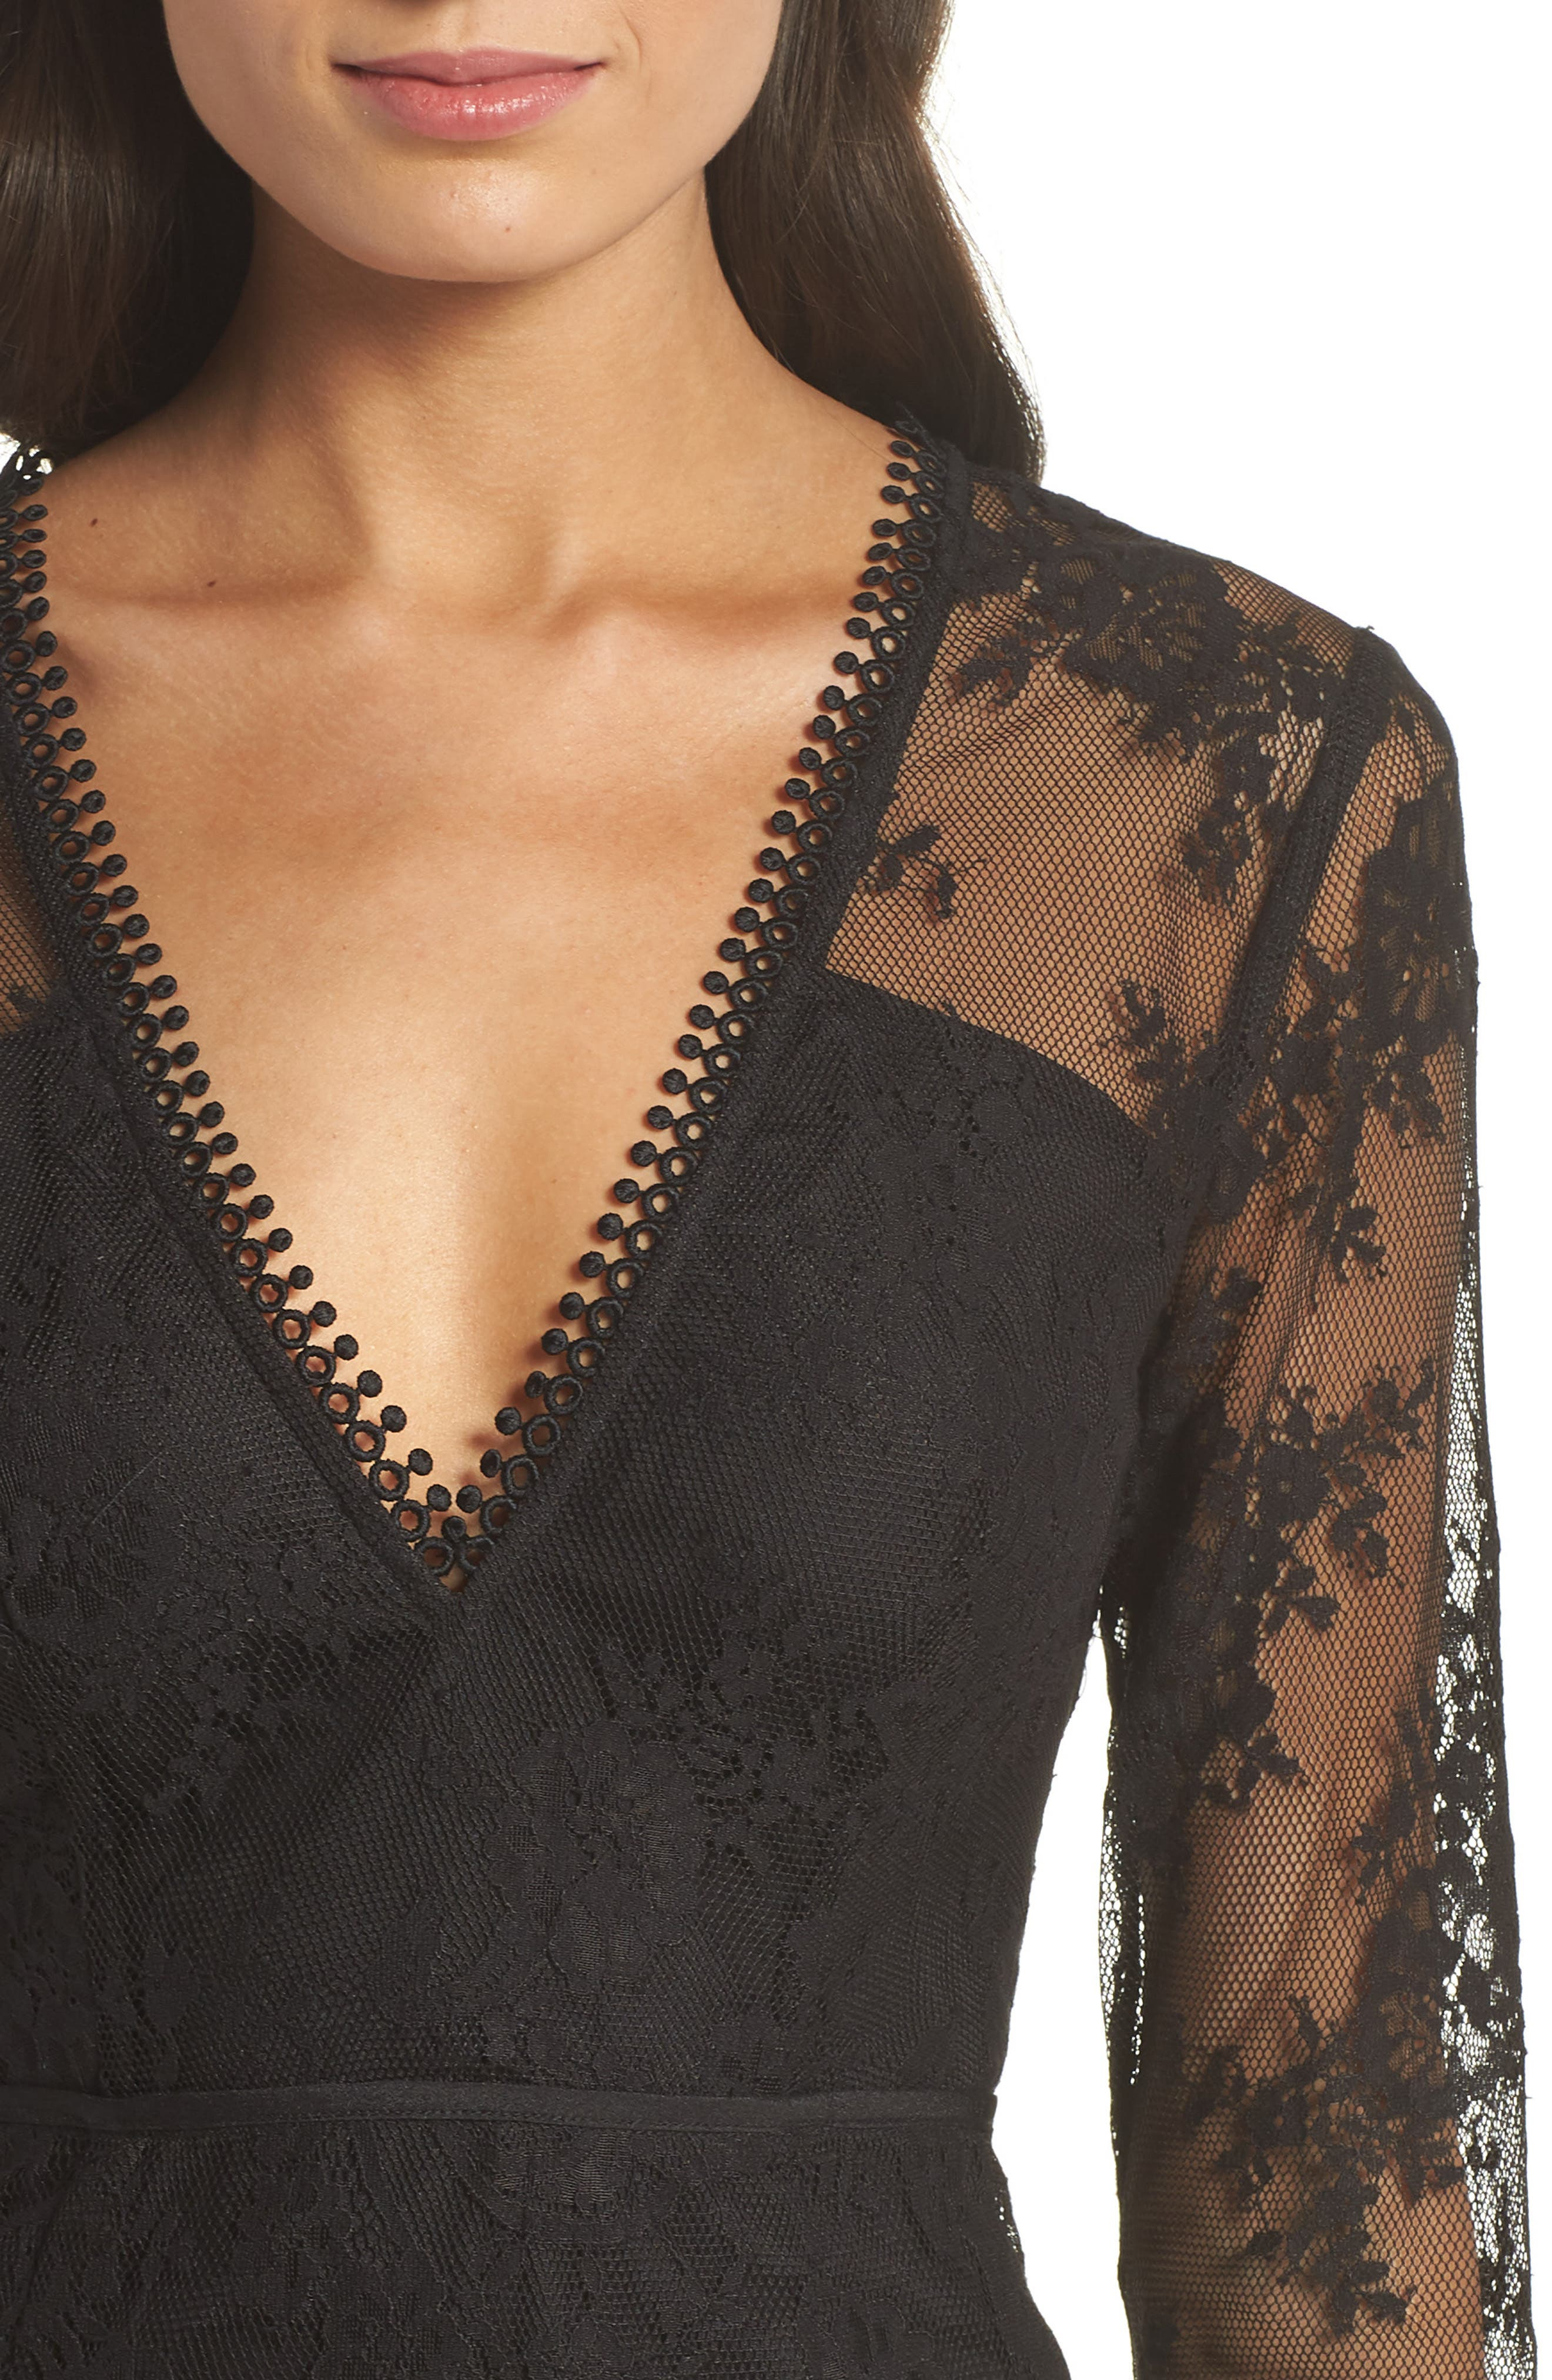 True Chemistry Lace Sheath Dress,                             Alternate thumbnail 4, color,                             001